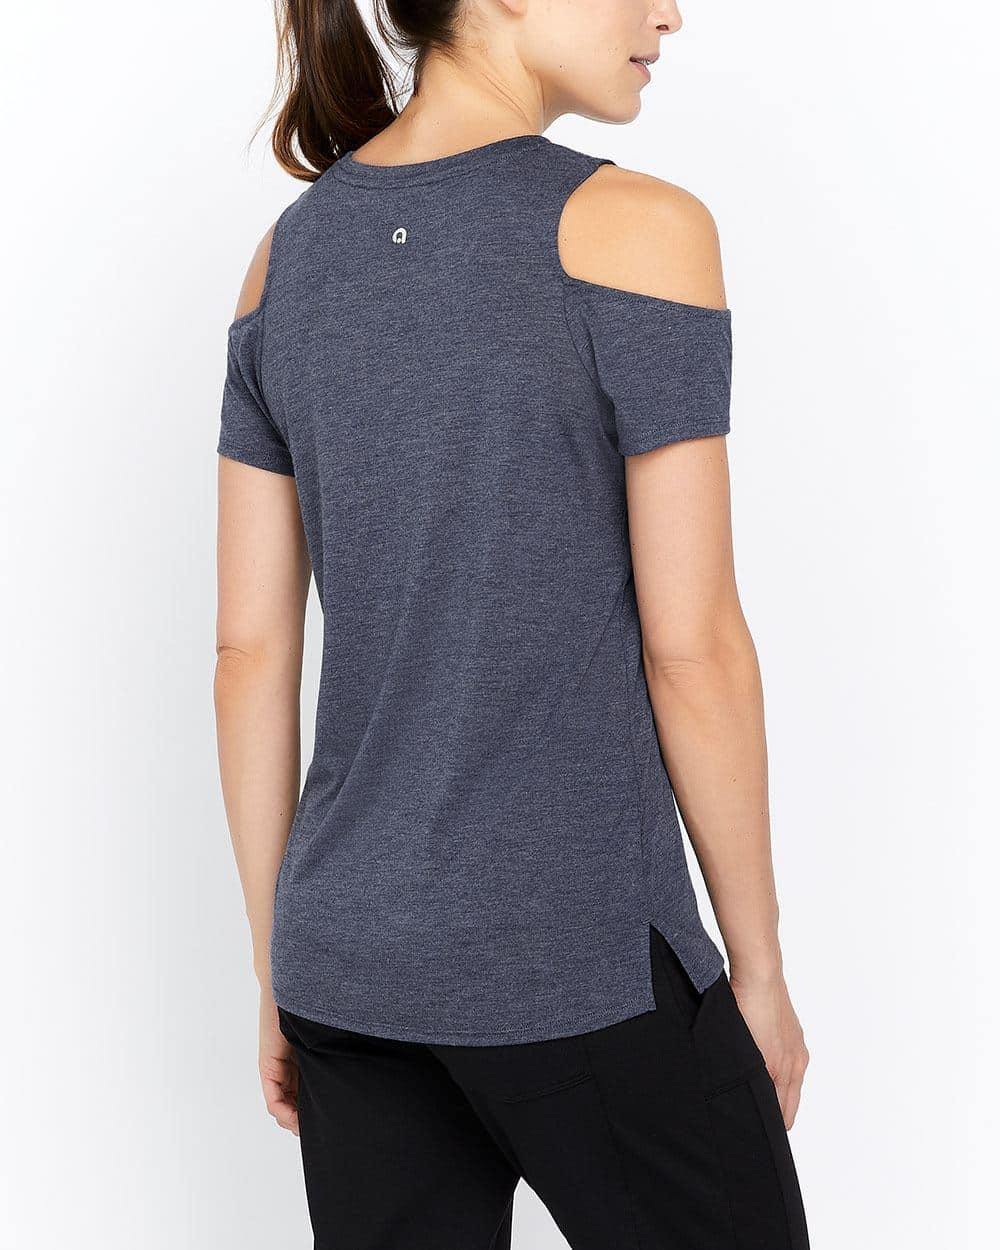 Hyba Cold-Shoulder T-Shirt